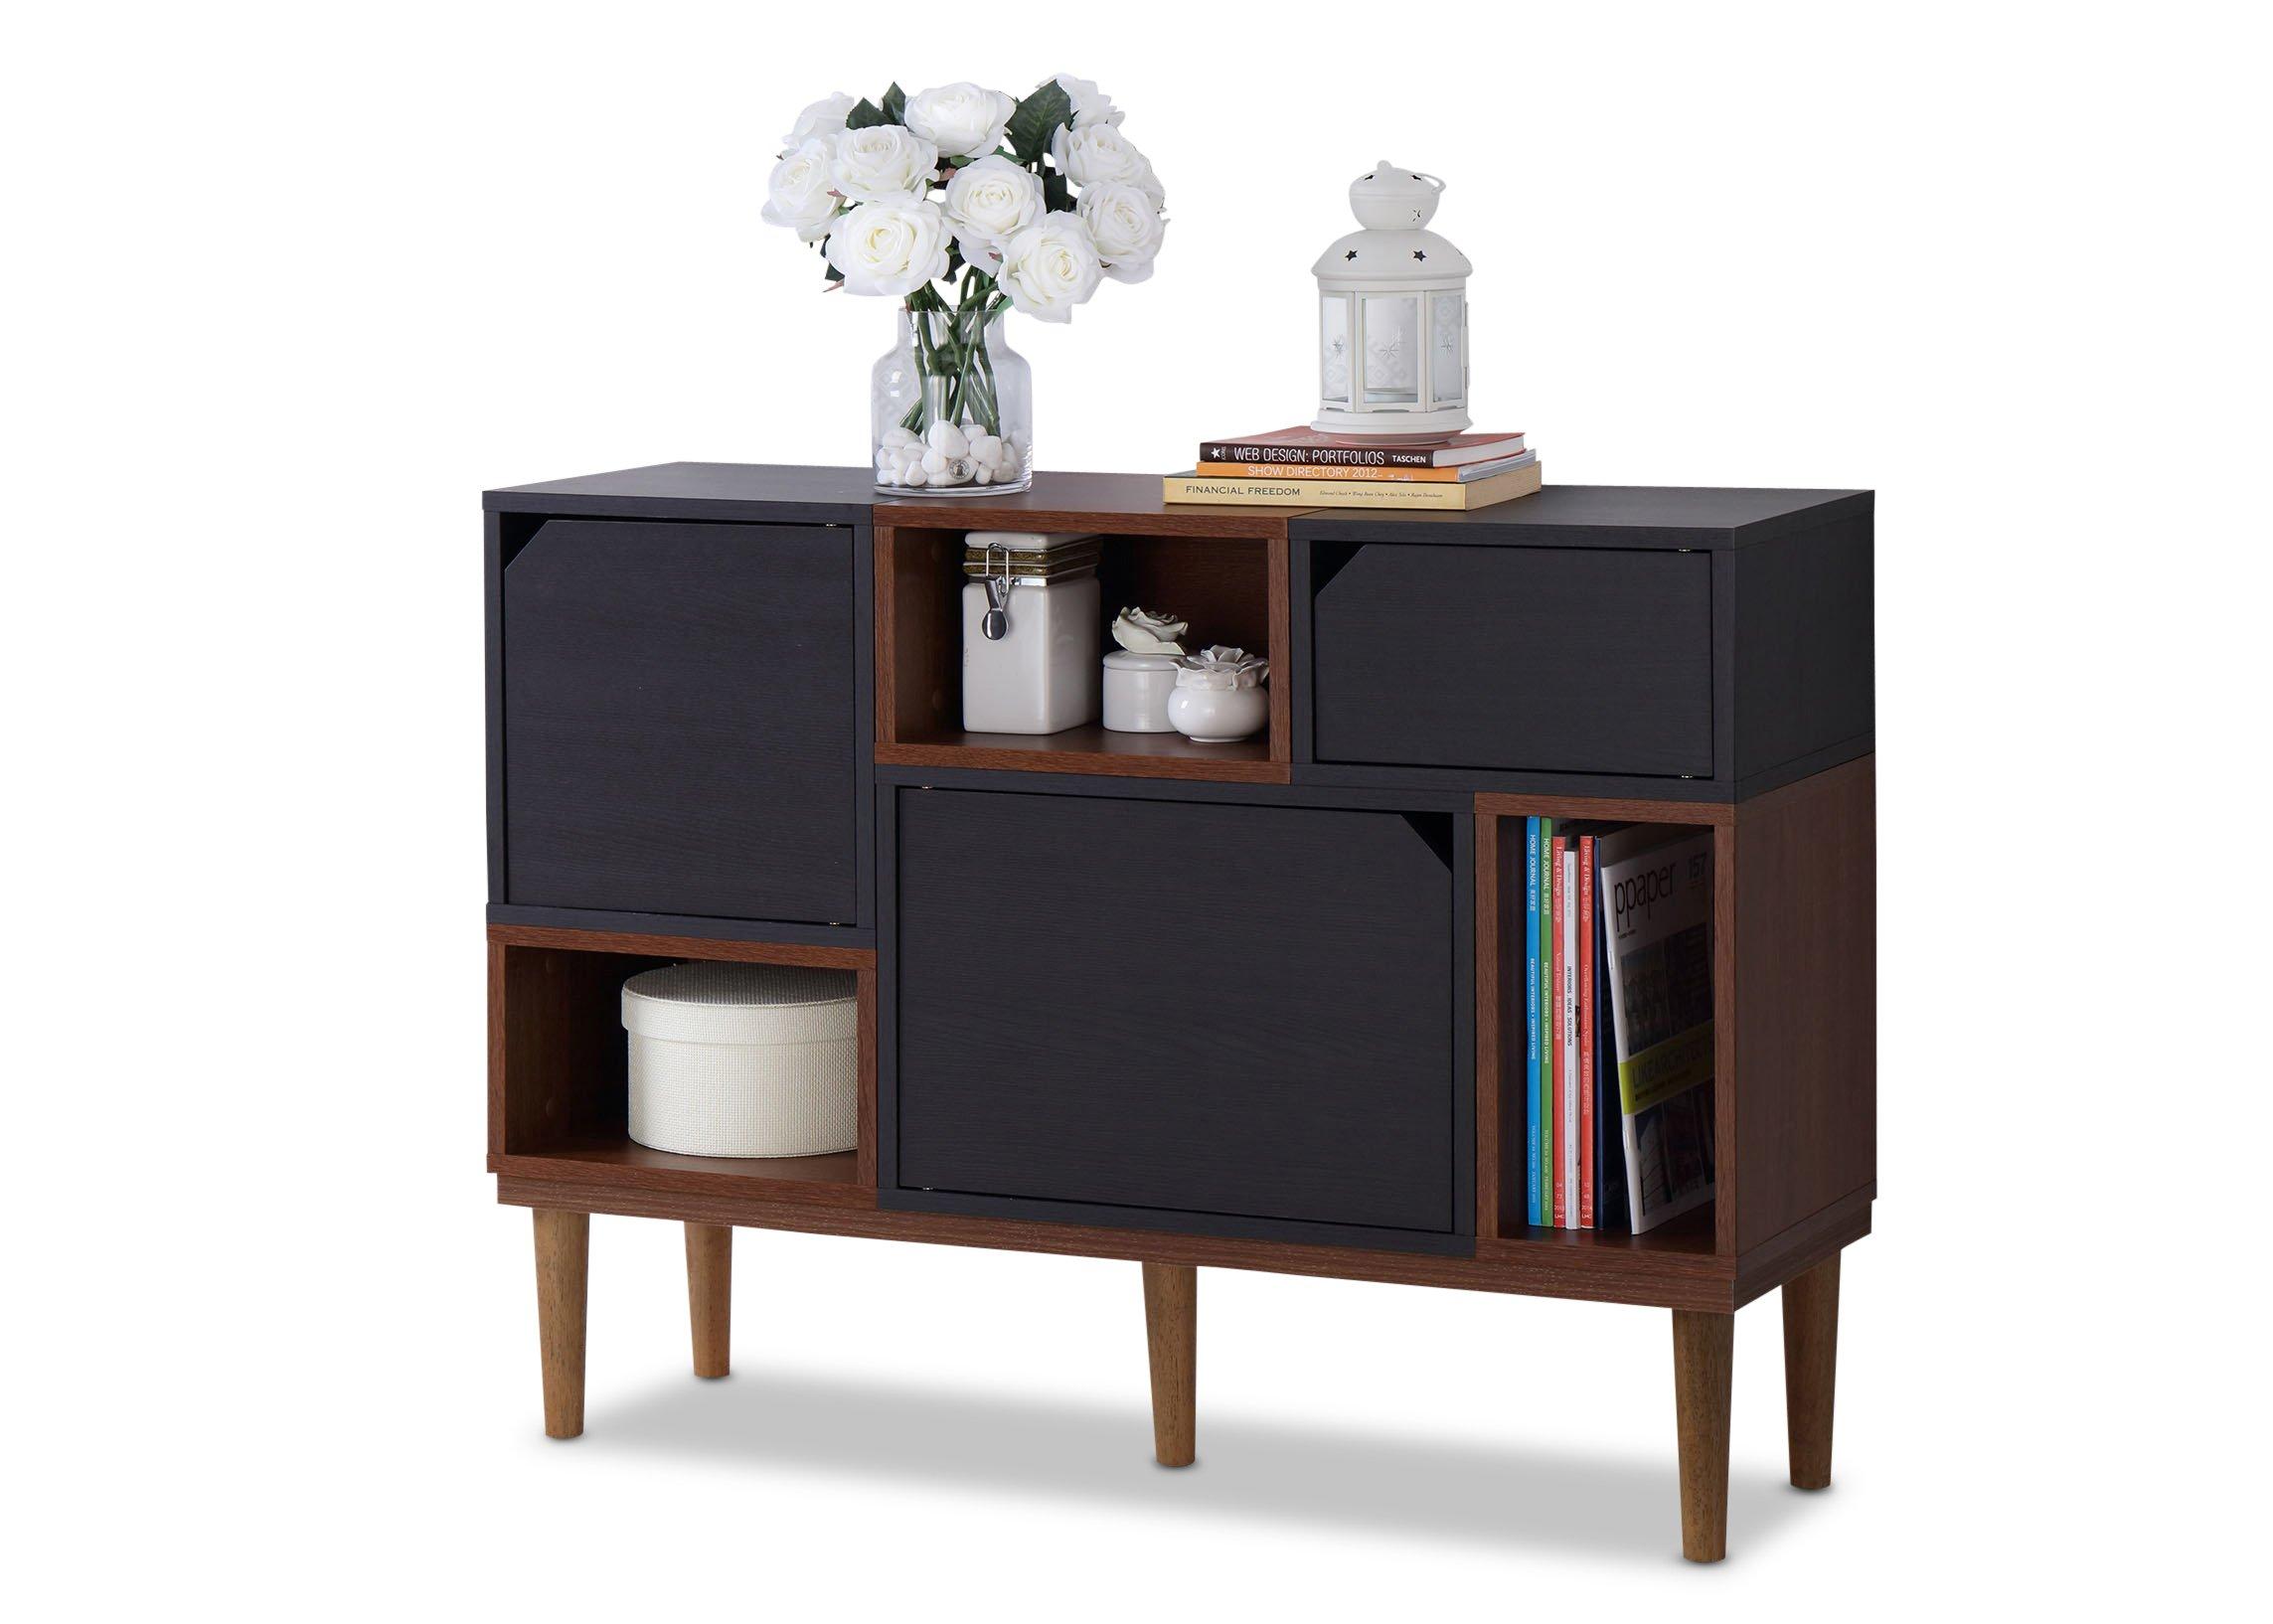 Baxton Furniture Studios Anderson Mid-Century Retro Modern Oak and Wood Sideboard Storage, Espresso by Baxton Studio